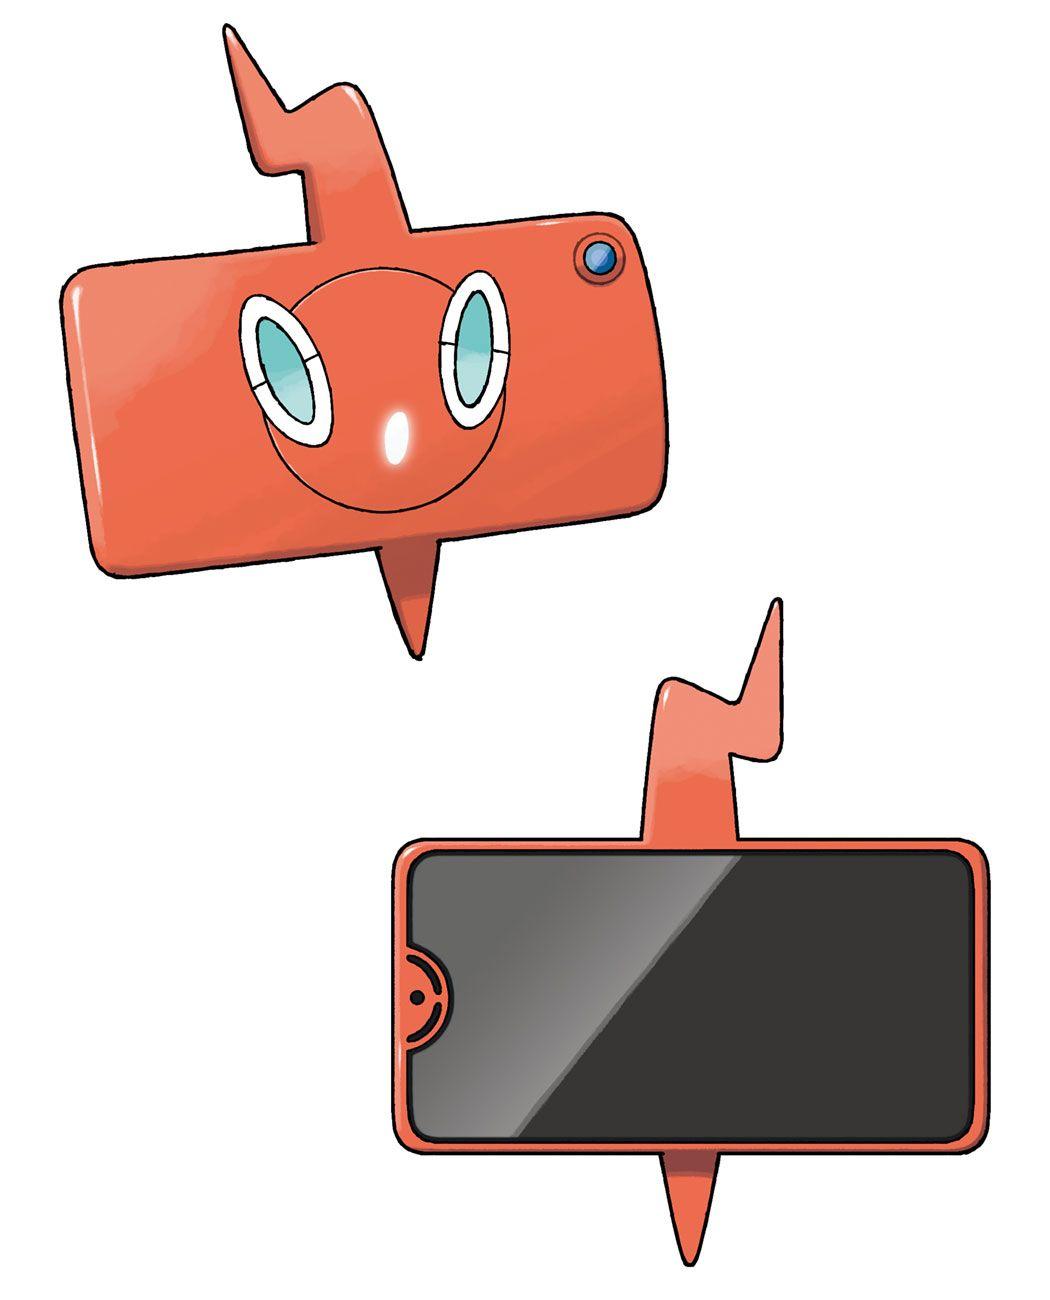 Rotom Phone Screen Art from Pokémon Sword and Shield art